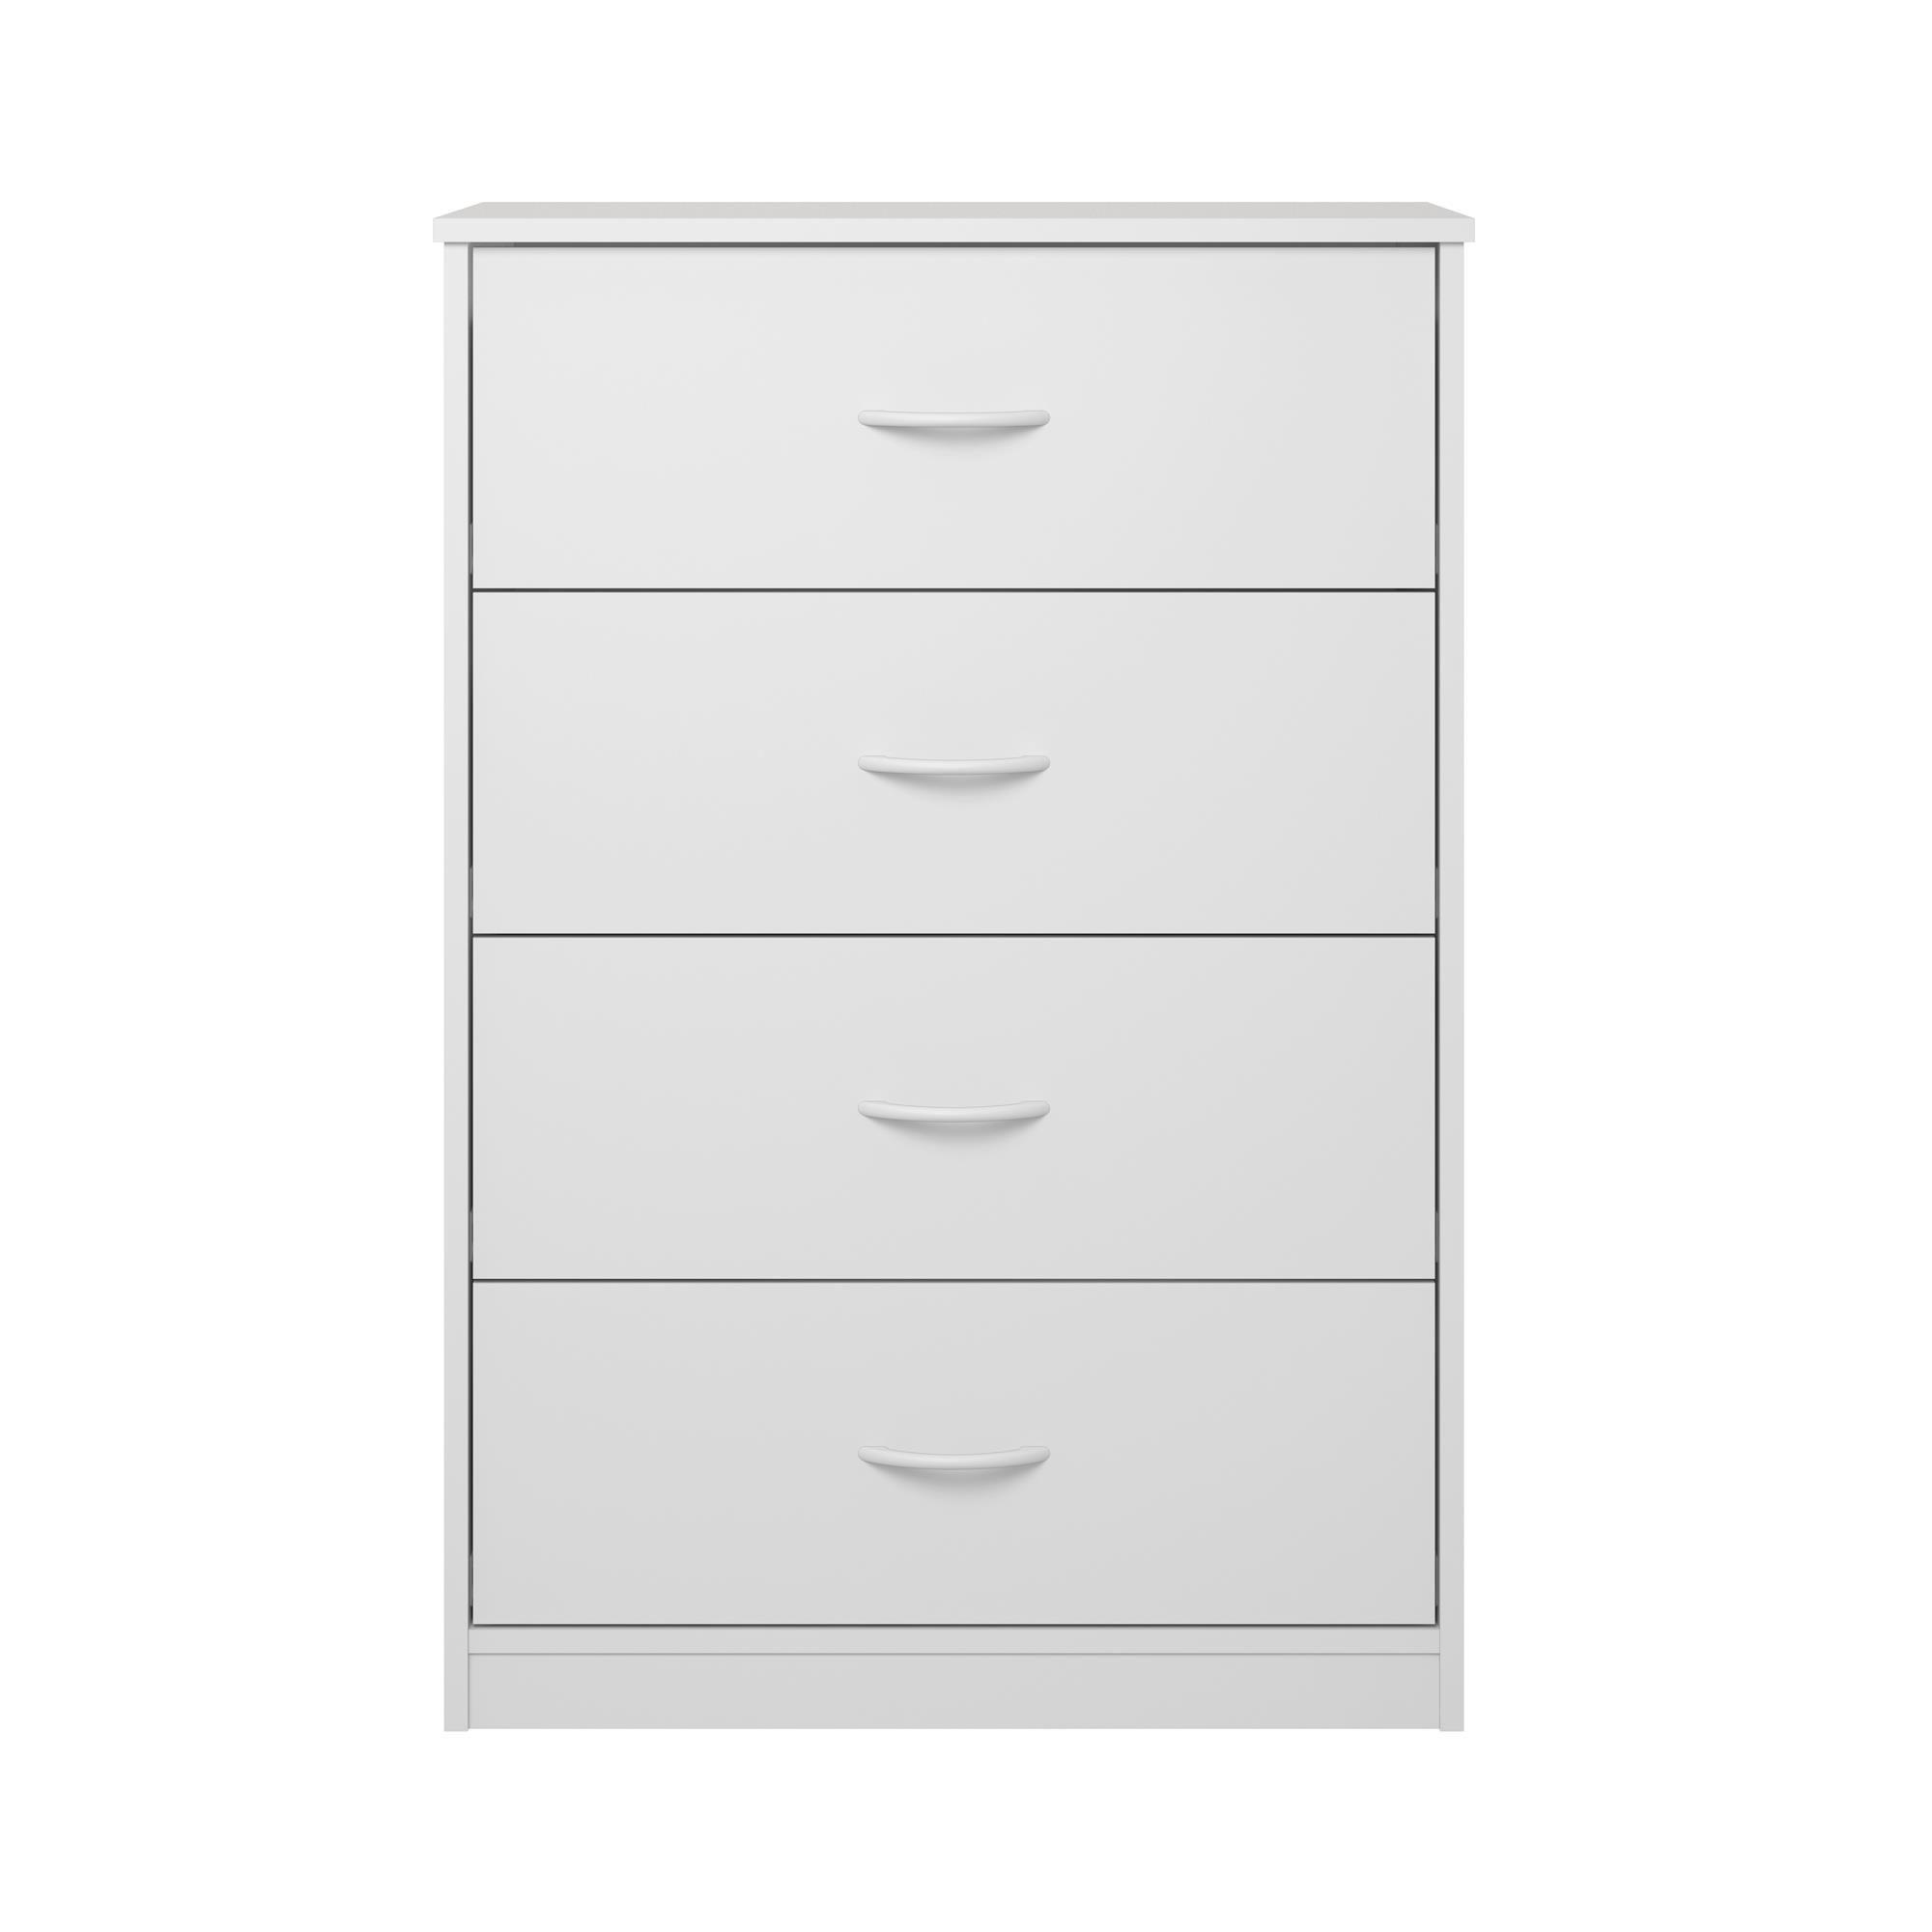 Mainstays Classic 4 Drawer Dresser Espresso Finish Walmart Com Drawers Dresser Drawers 4 Drawer Dresser [ 2000 x 2000 Pixel ]